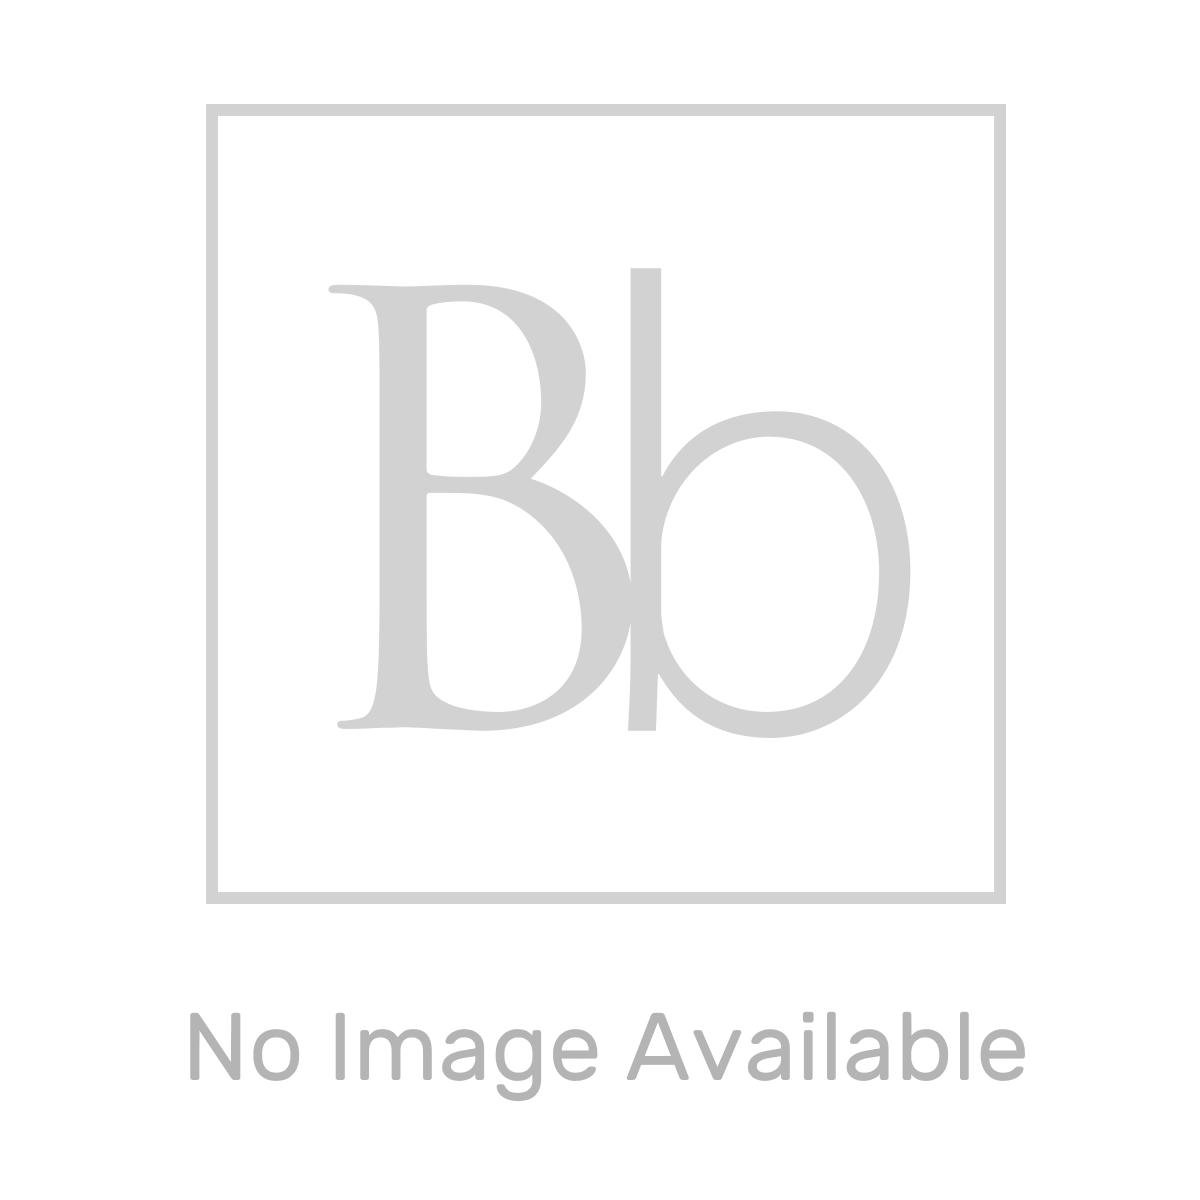 Nuie Athena Hacienda Black 2 Drawer Floor Standing Vanity Unit with 40mm Profile Basin 800mm